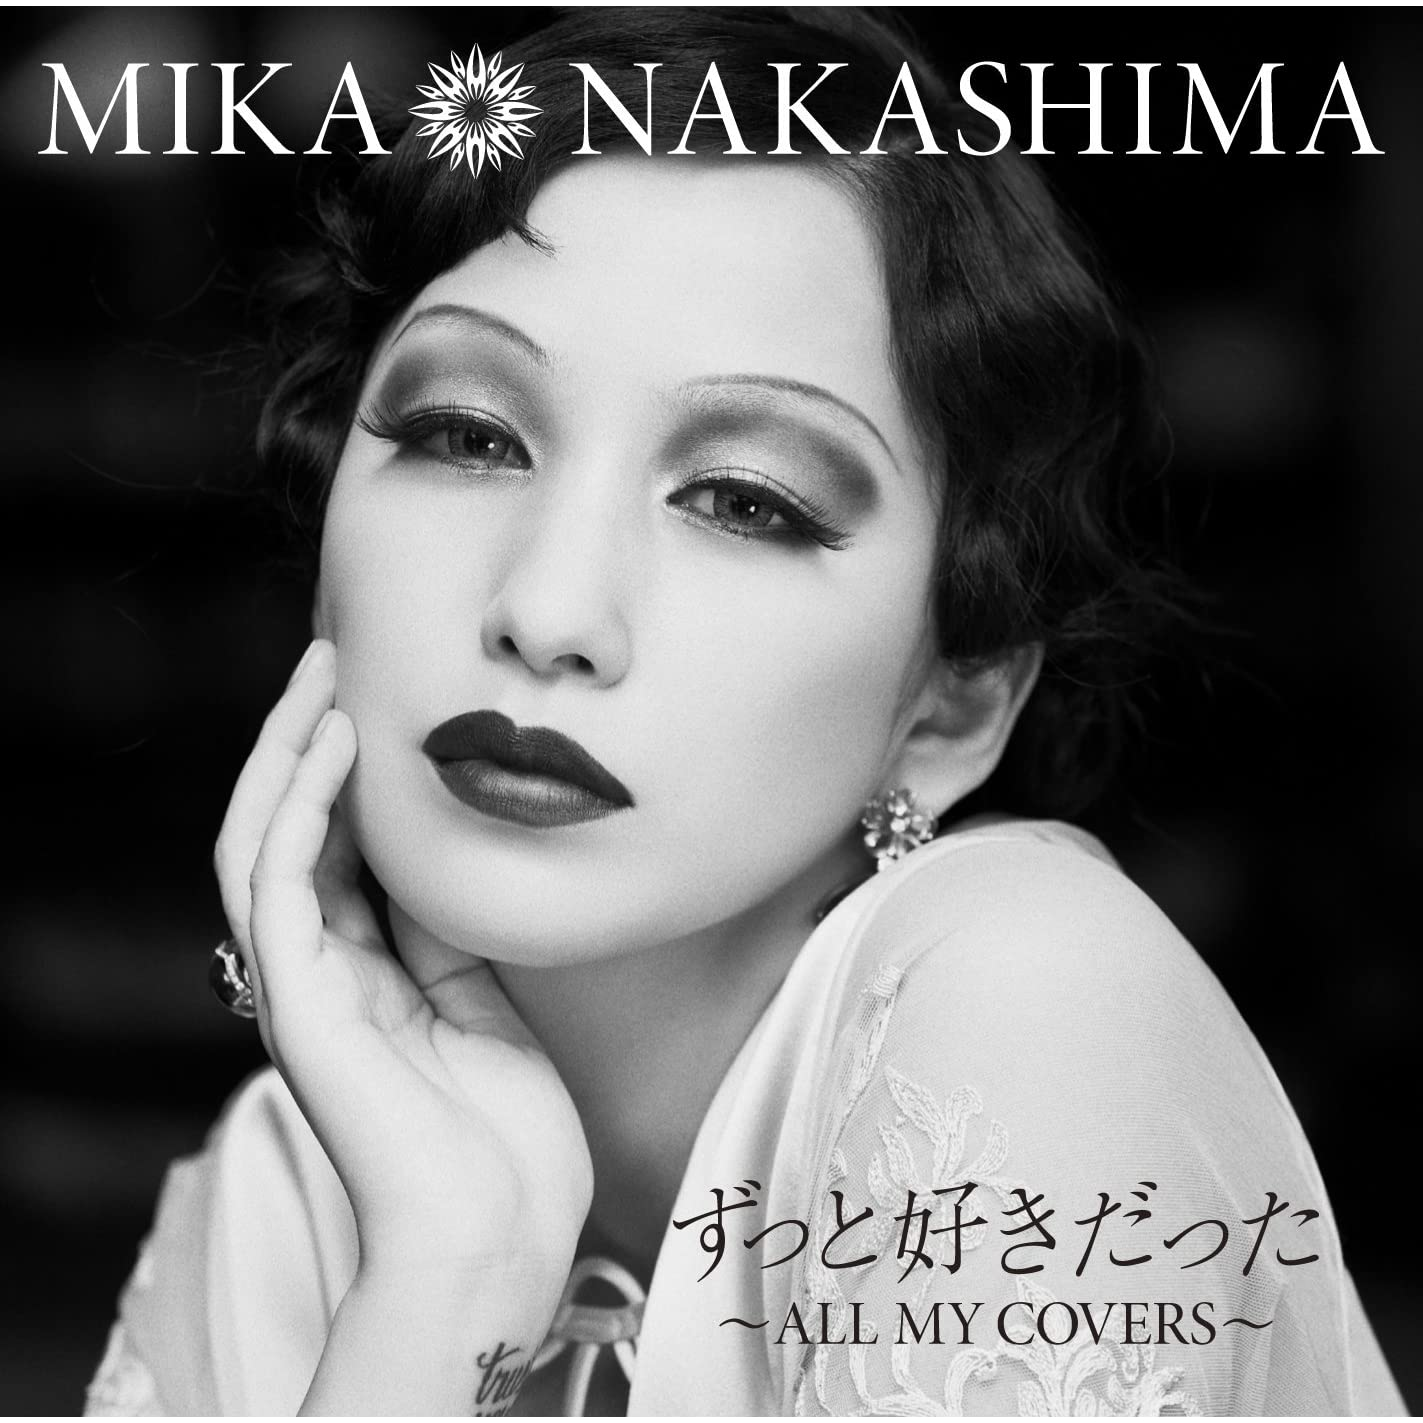 [Album] Mika Nakashima 中島美嘉 – ずっと好きだった~ Zutto Suki Datta -All My Covers- (FLAC)